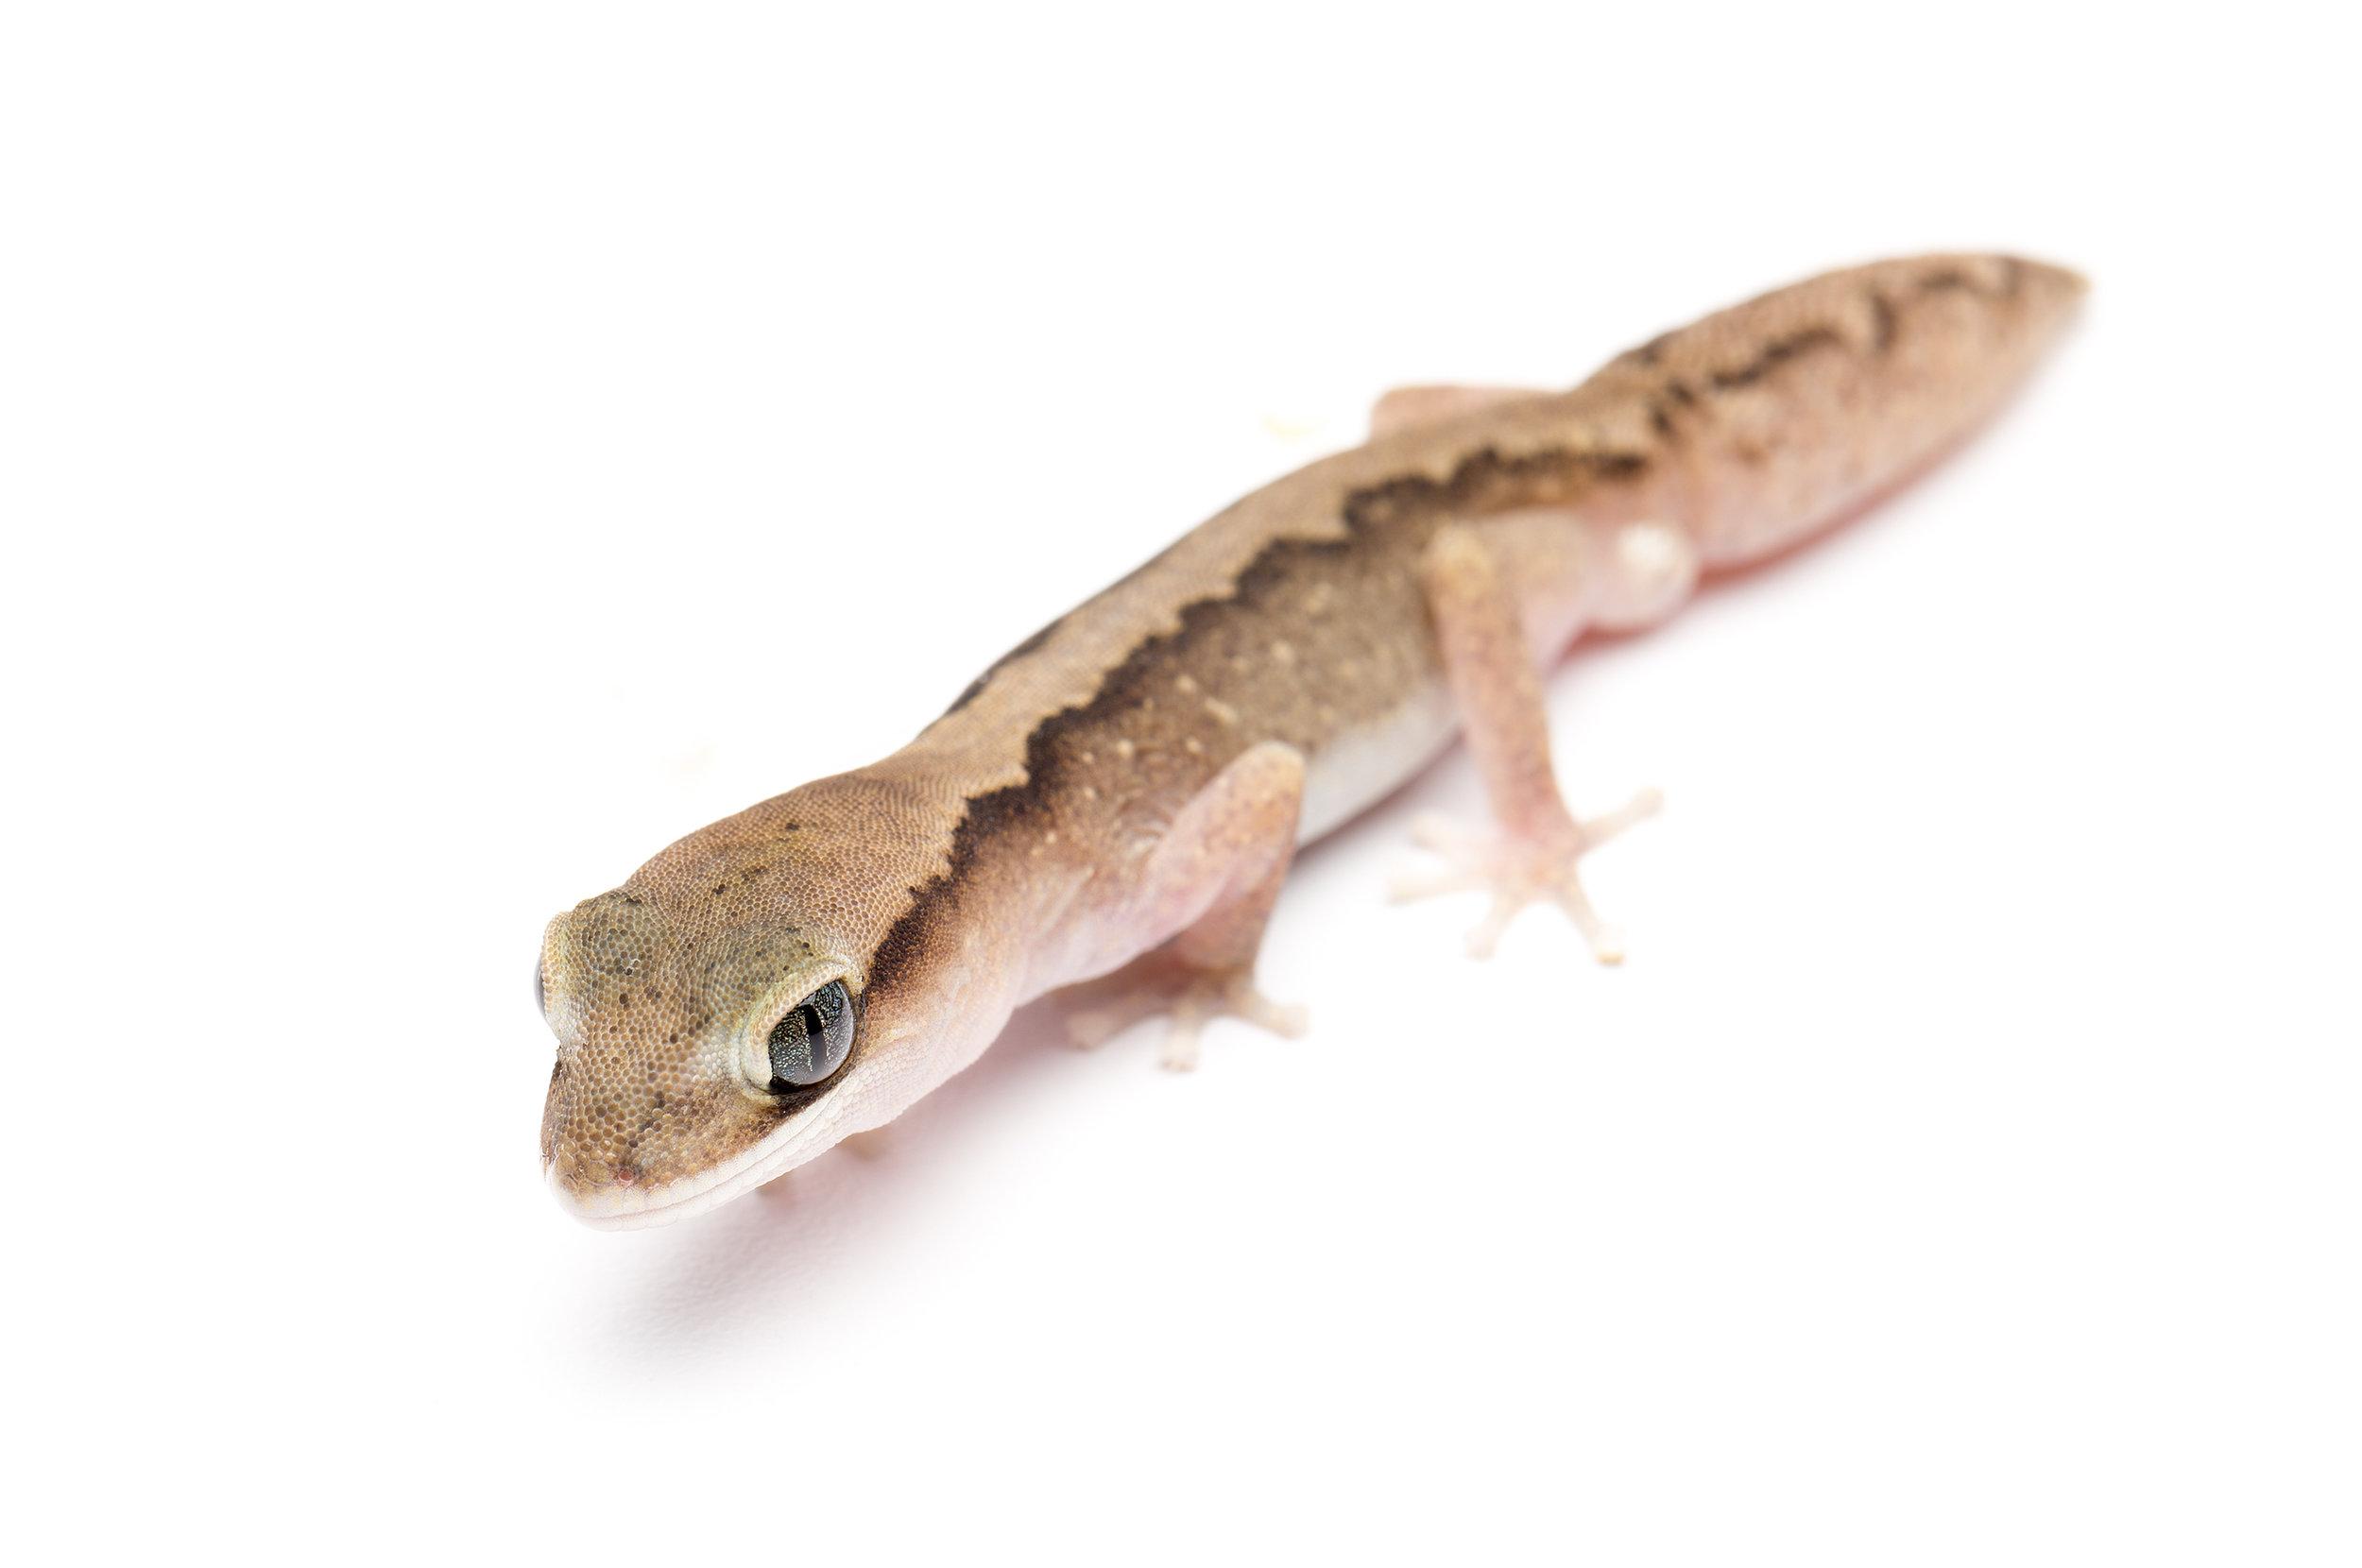 Male Diplodactylus vittatus